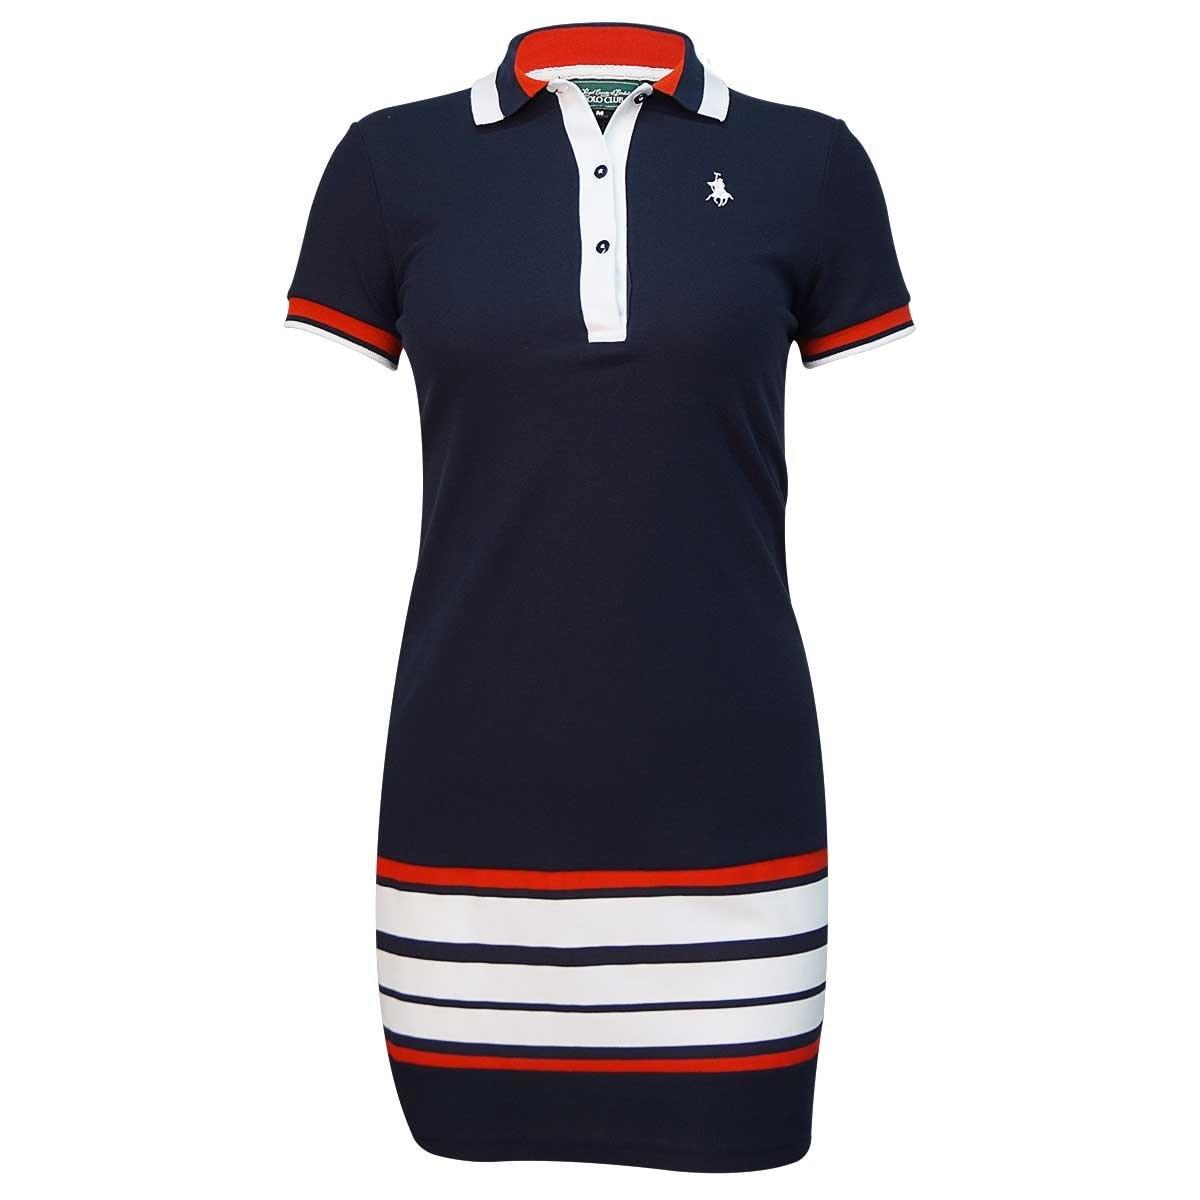 686579a0851a Vestido de franjas manga corta royal polo club